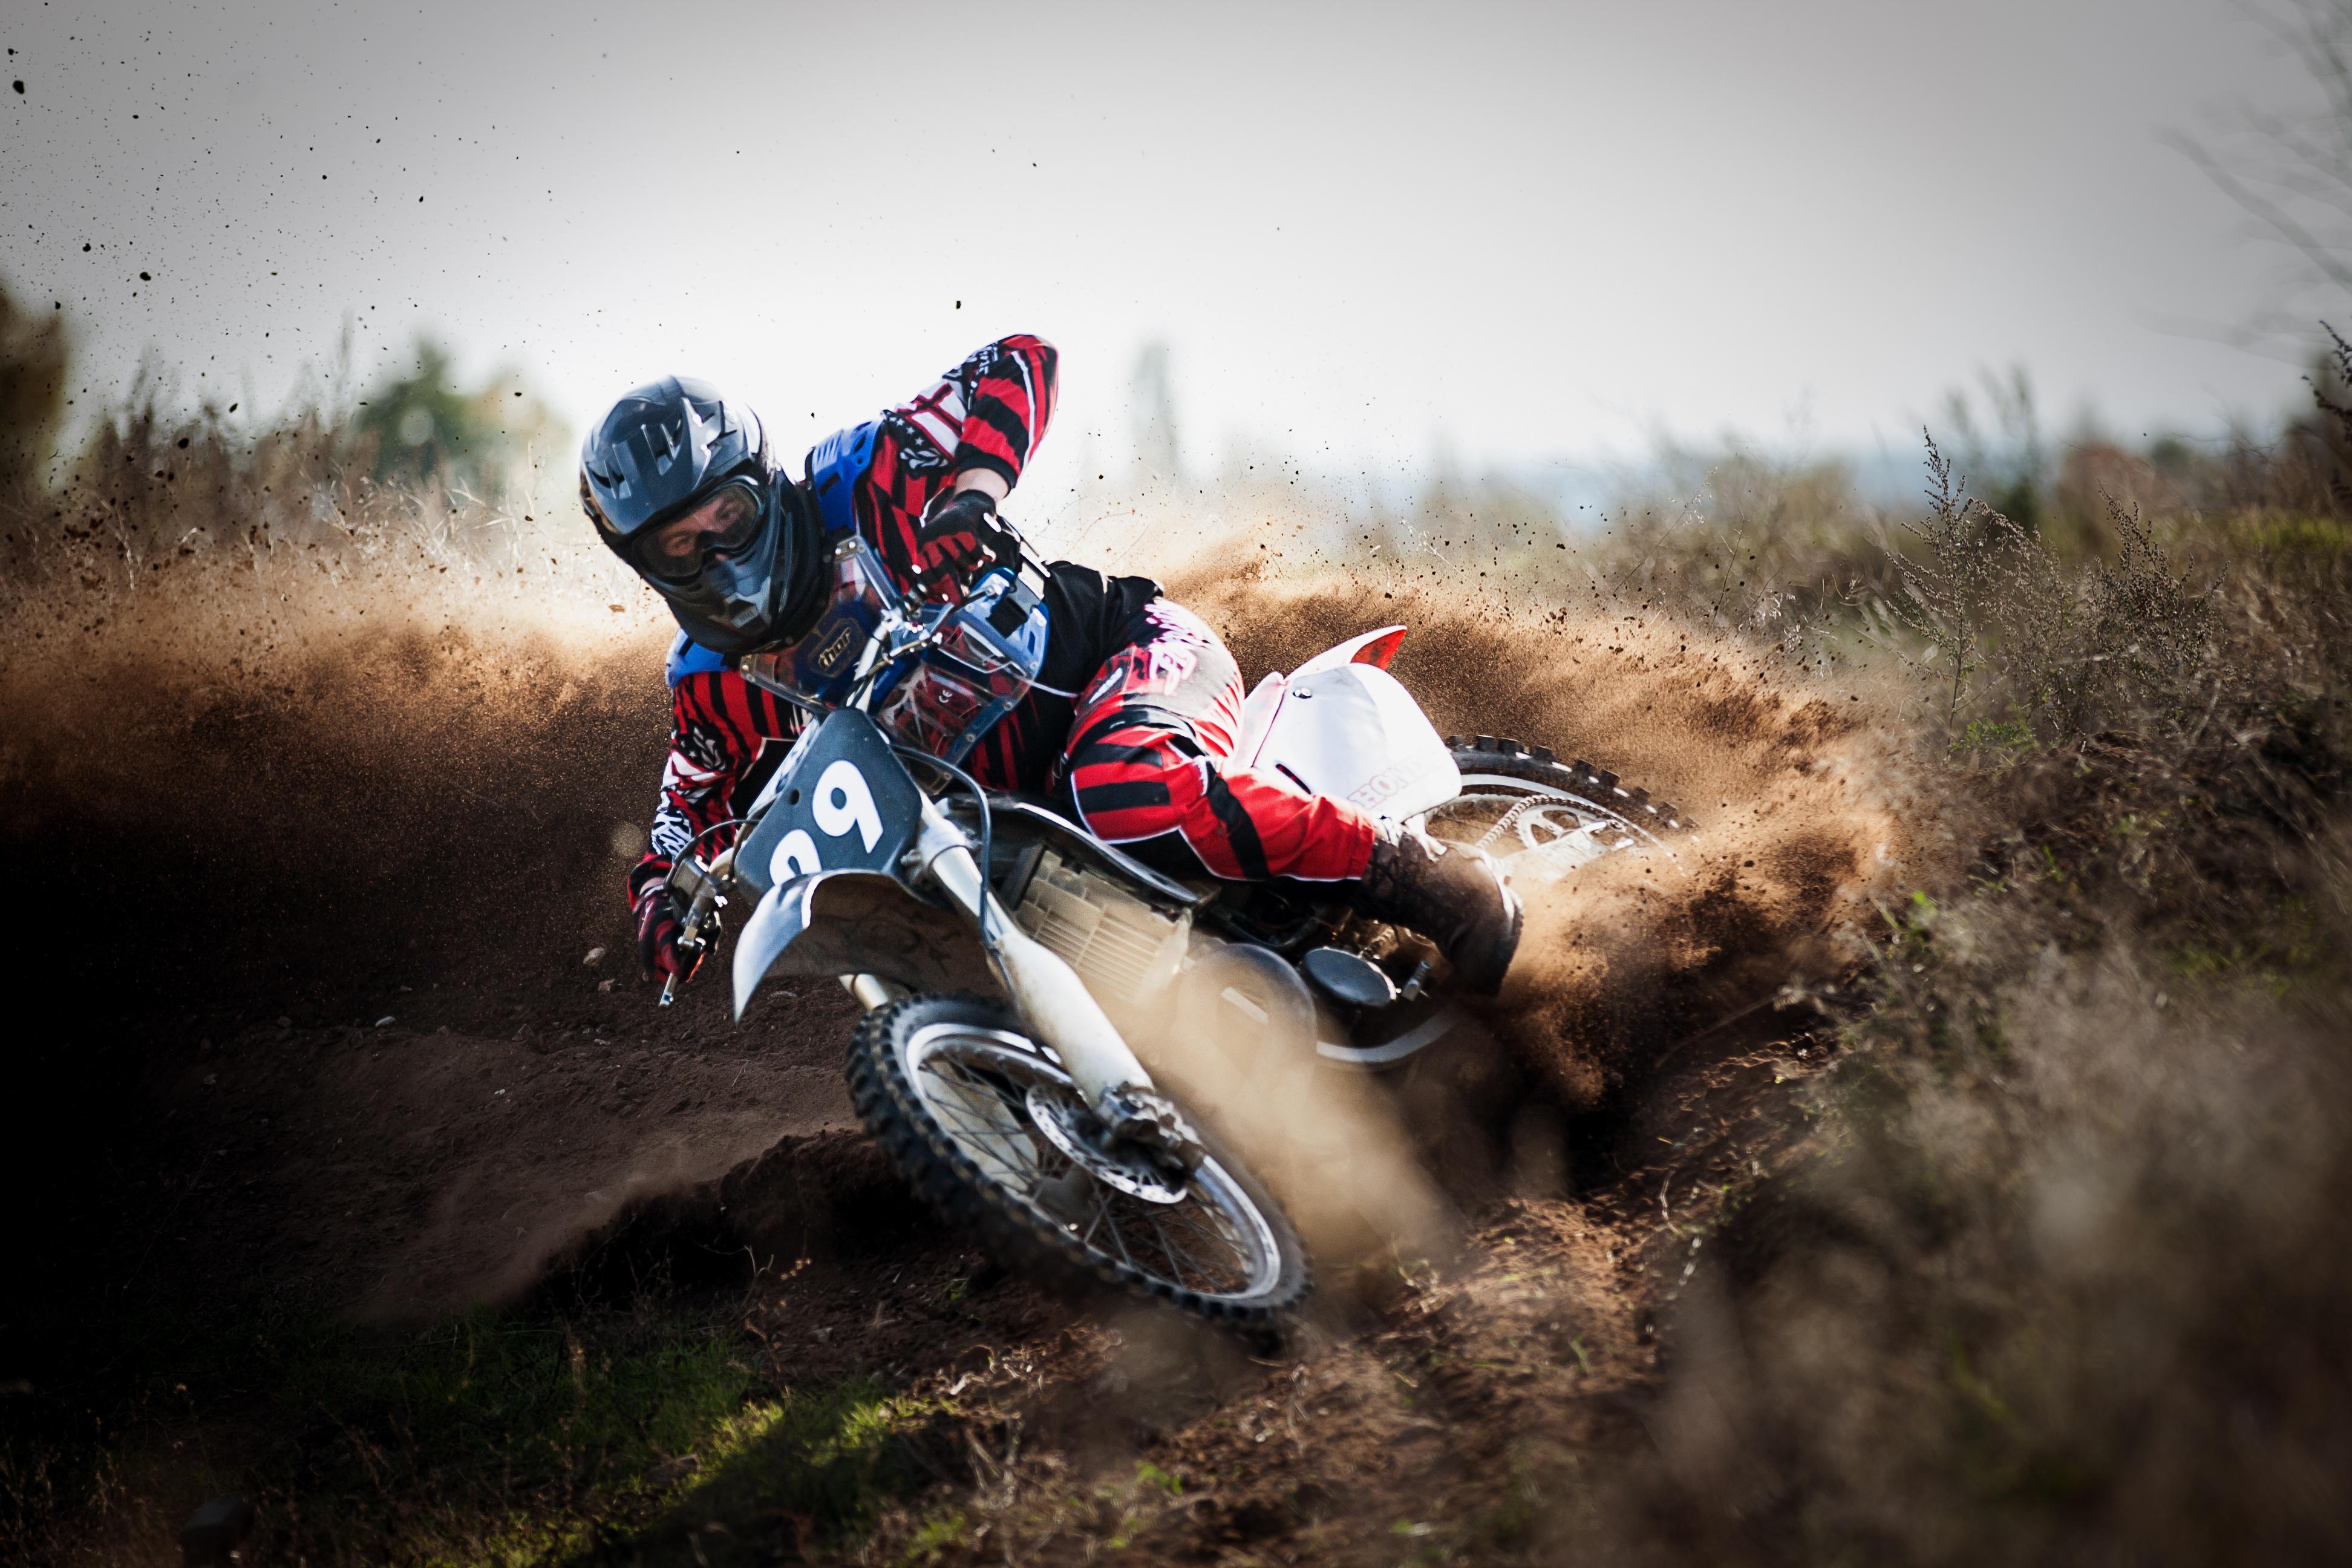 Moto-cross 4k Ultra Fond d'écran HD   Arrière-Plan   3888x2592   ID:806031 - Wallpaper Abyss